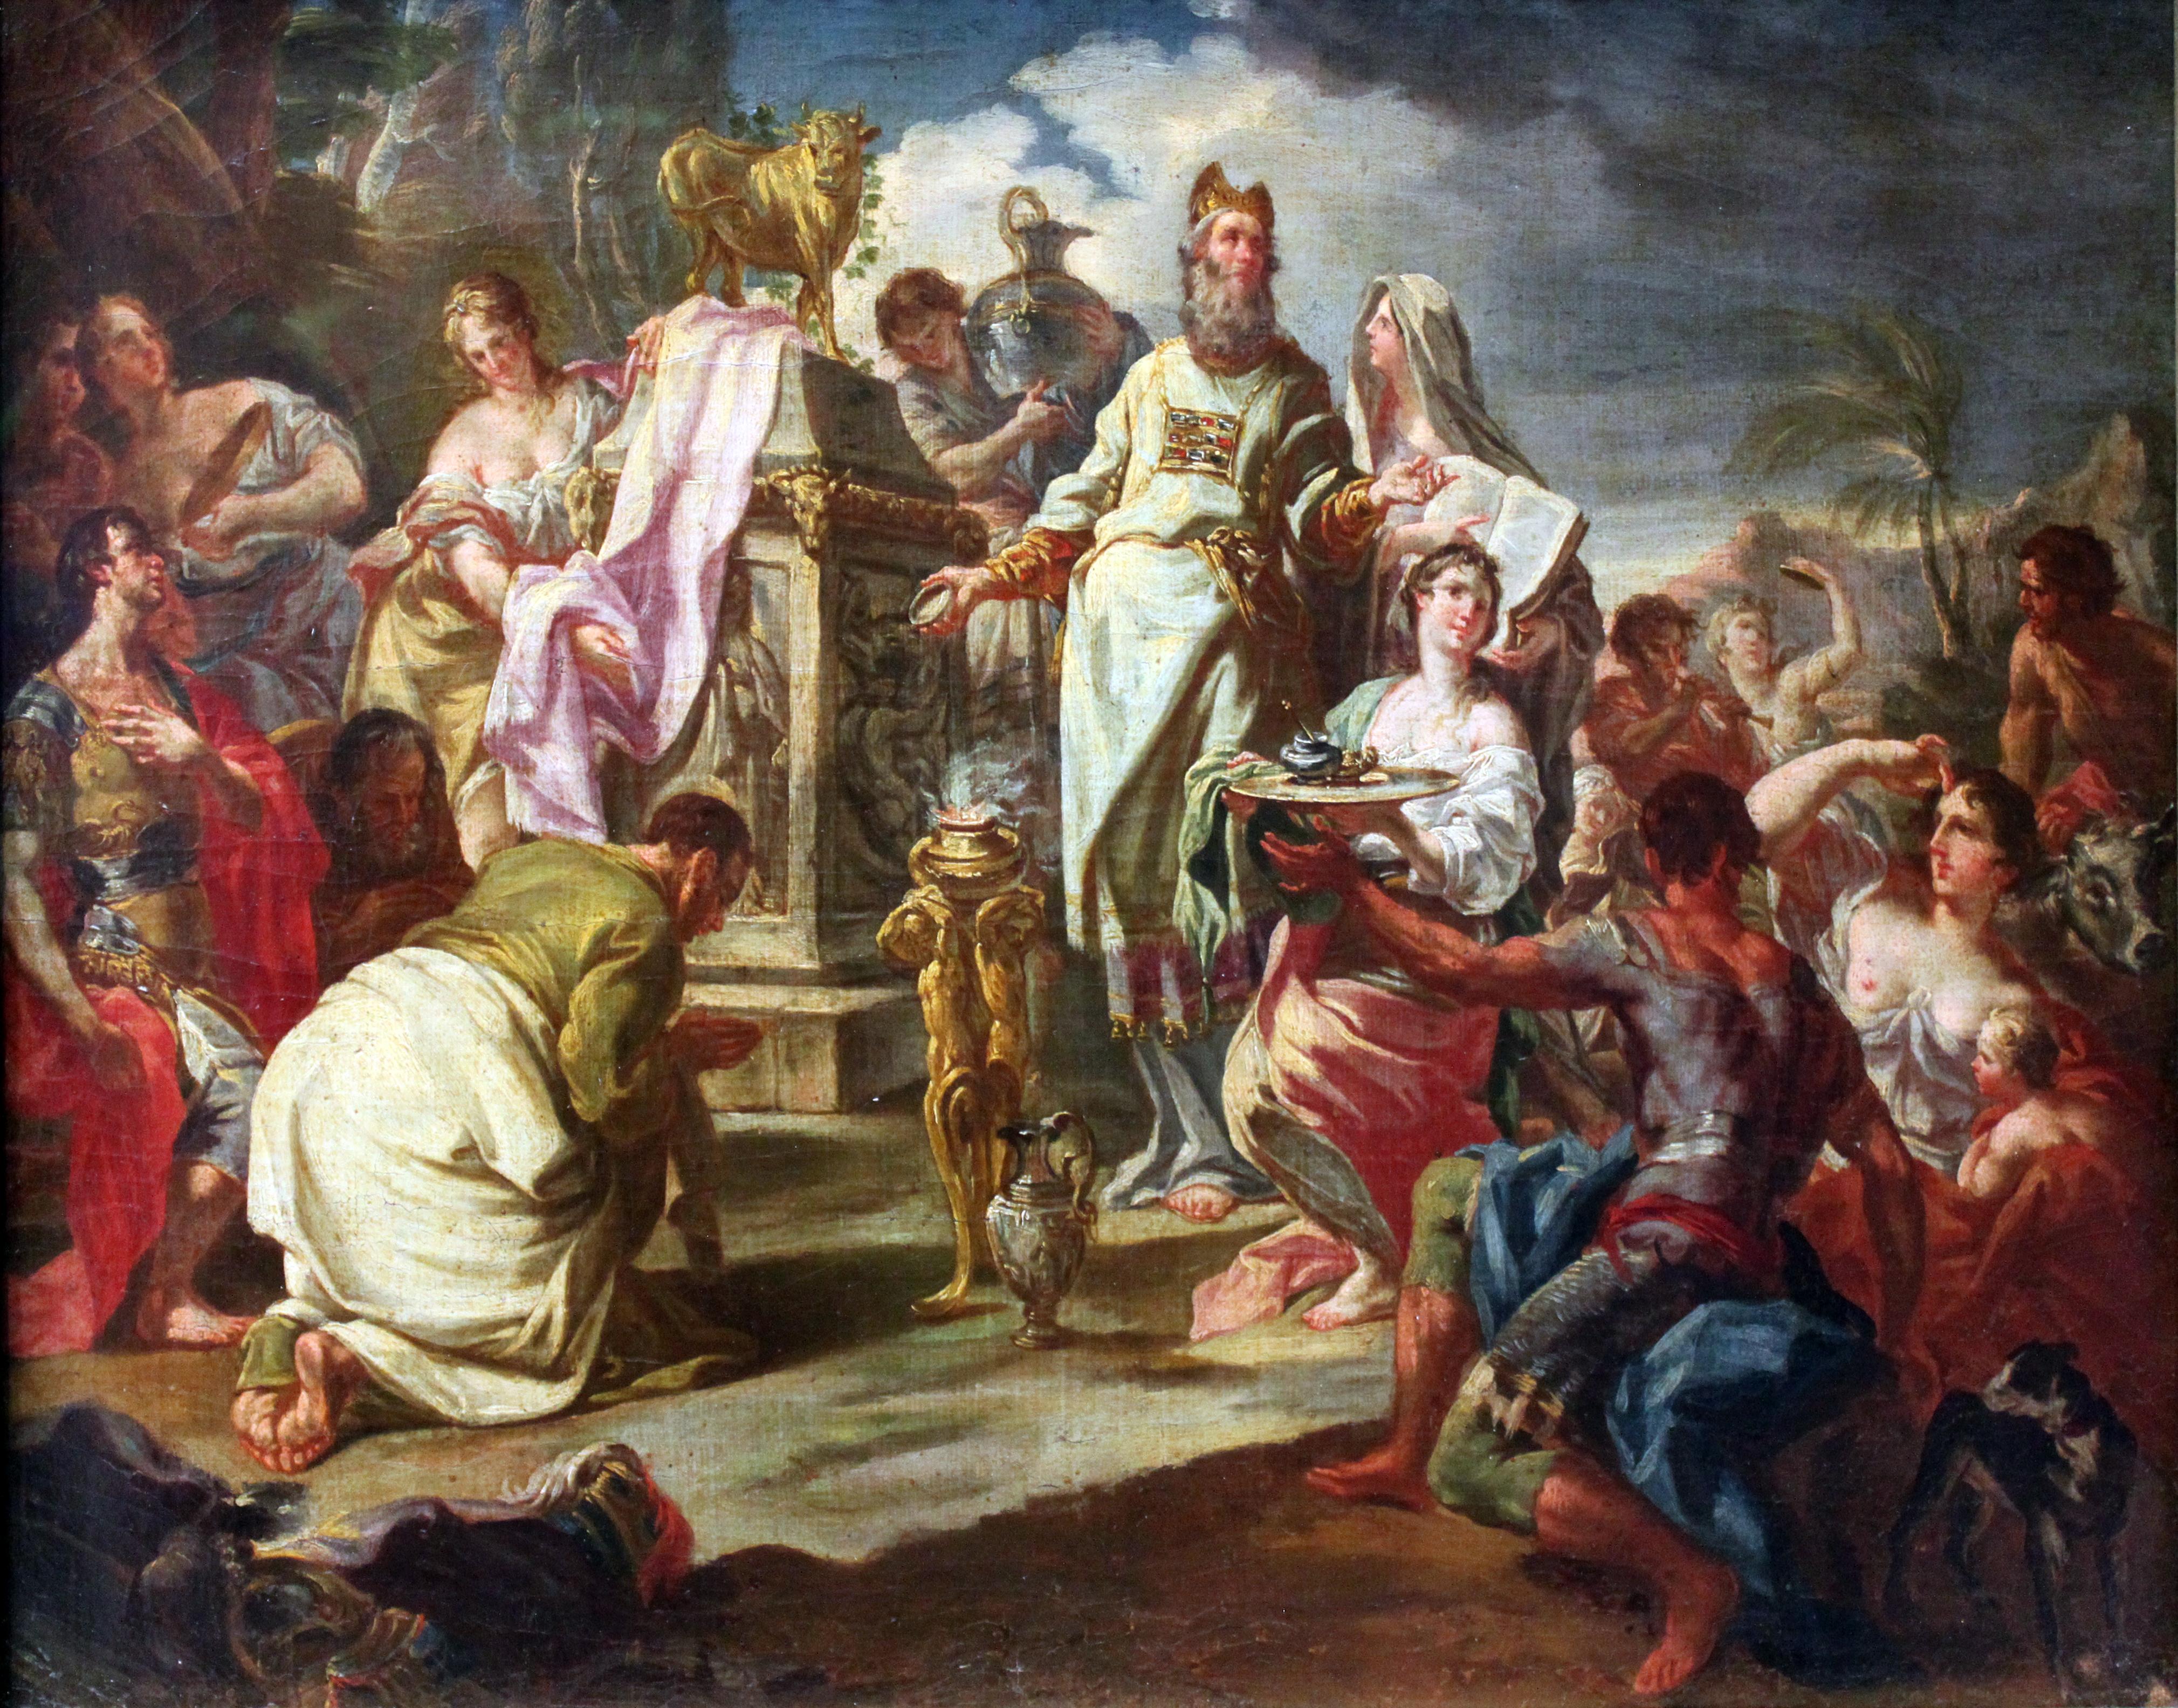 File:1730 Anbetung des Goldenen Kalbes anagoria.JPG